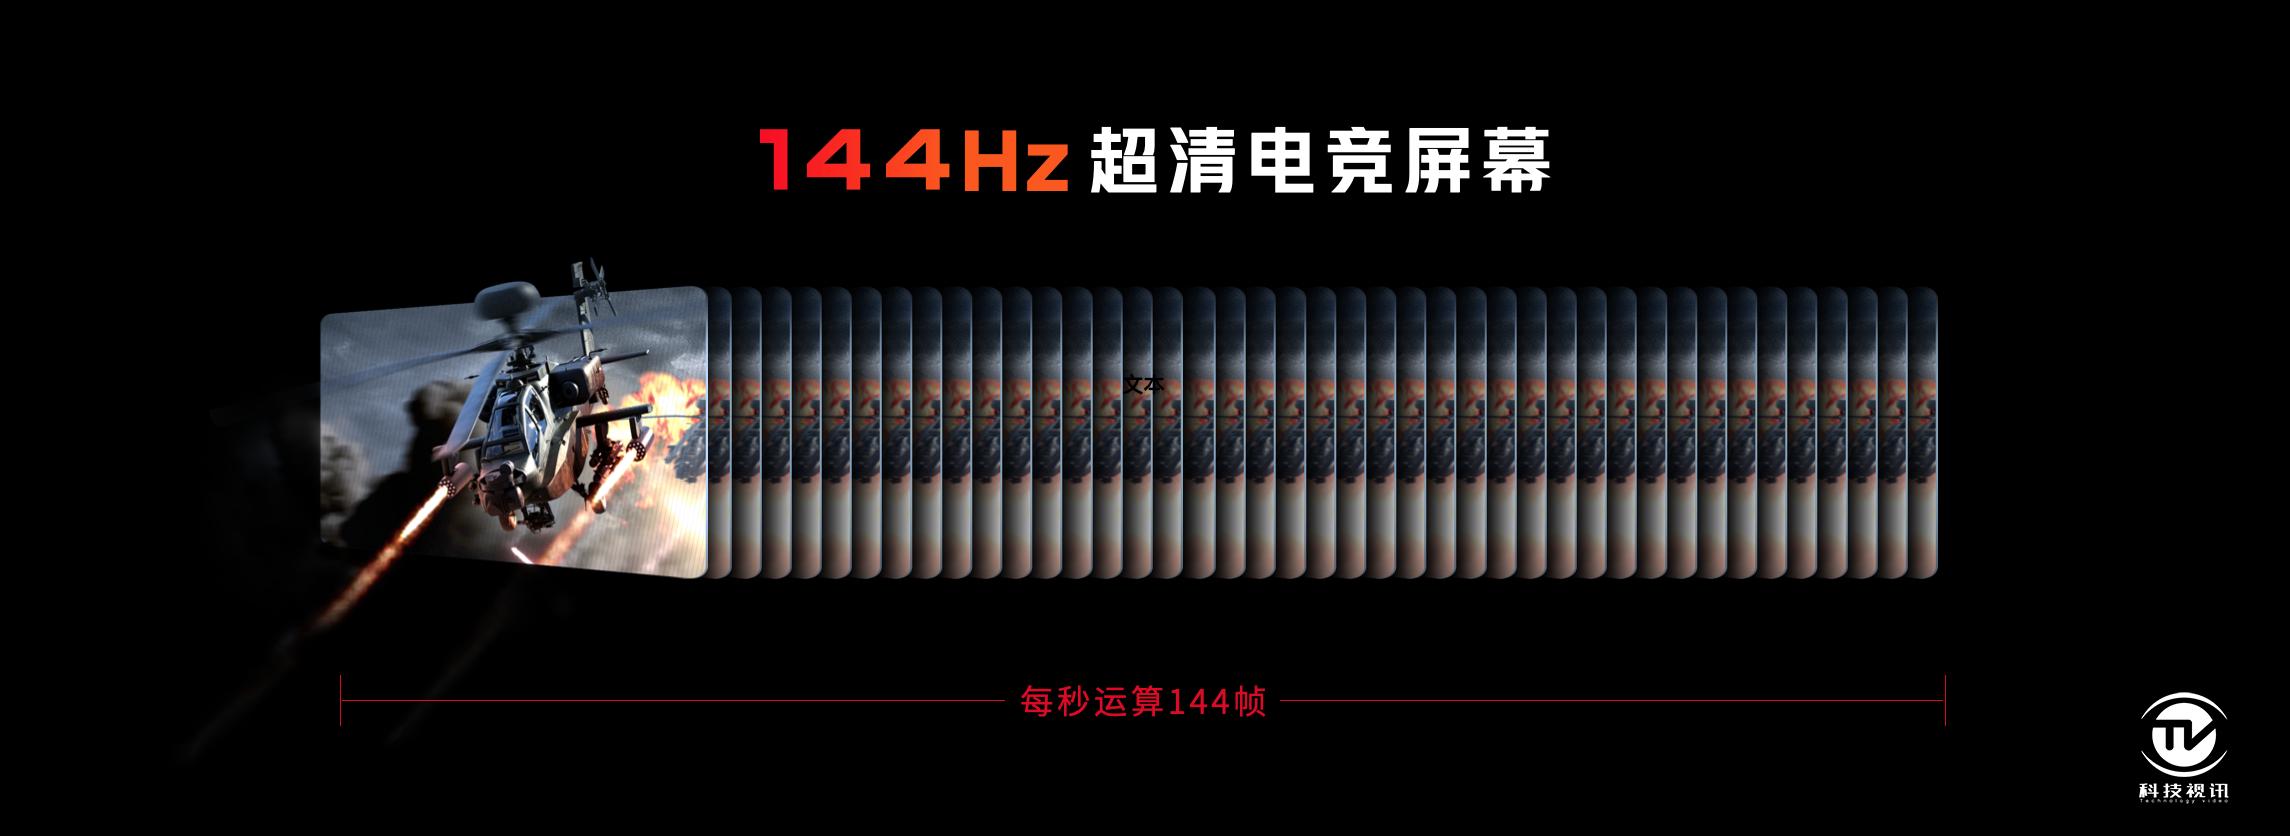 image027.png